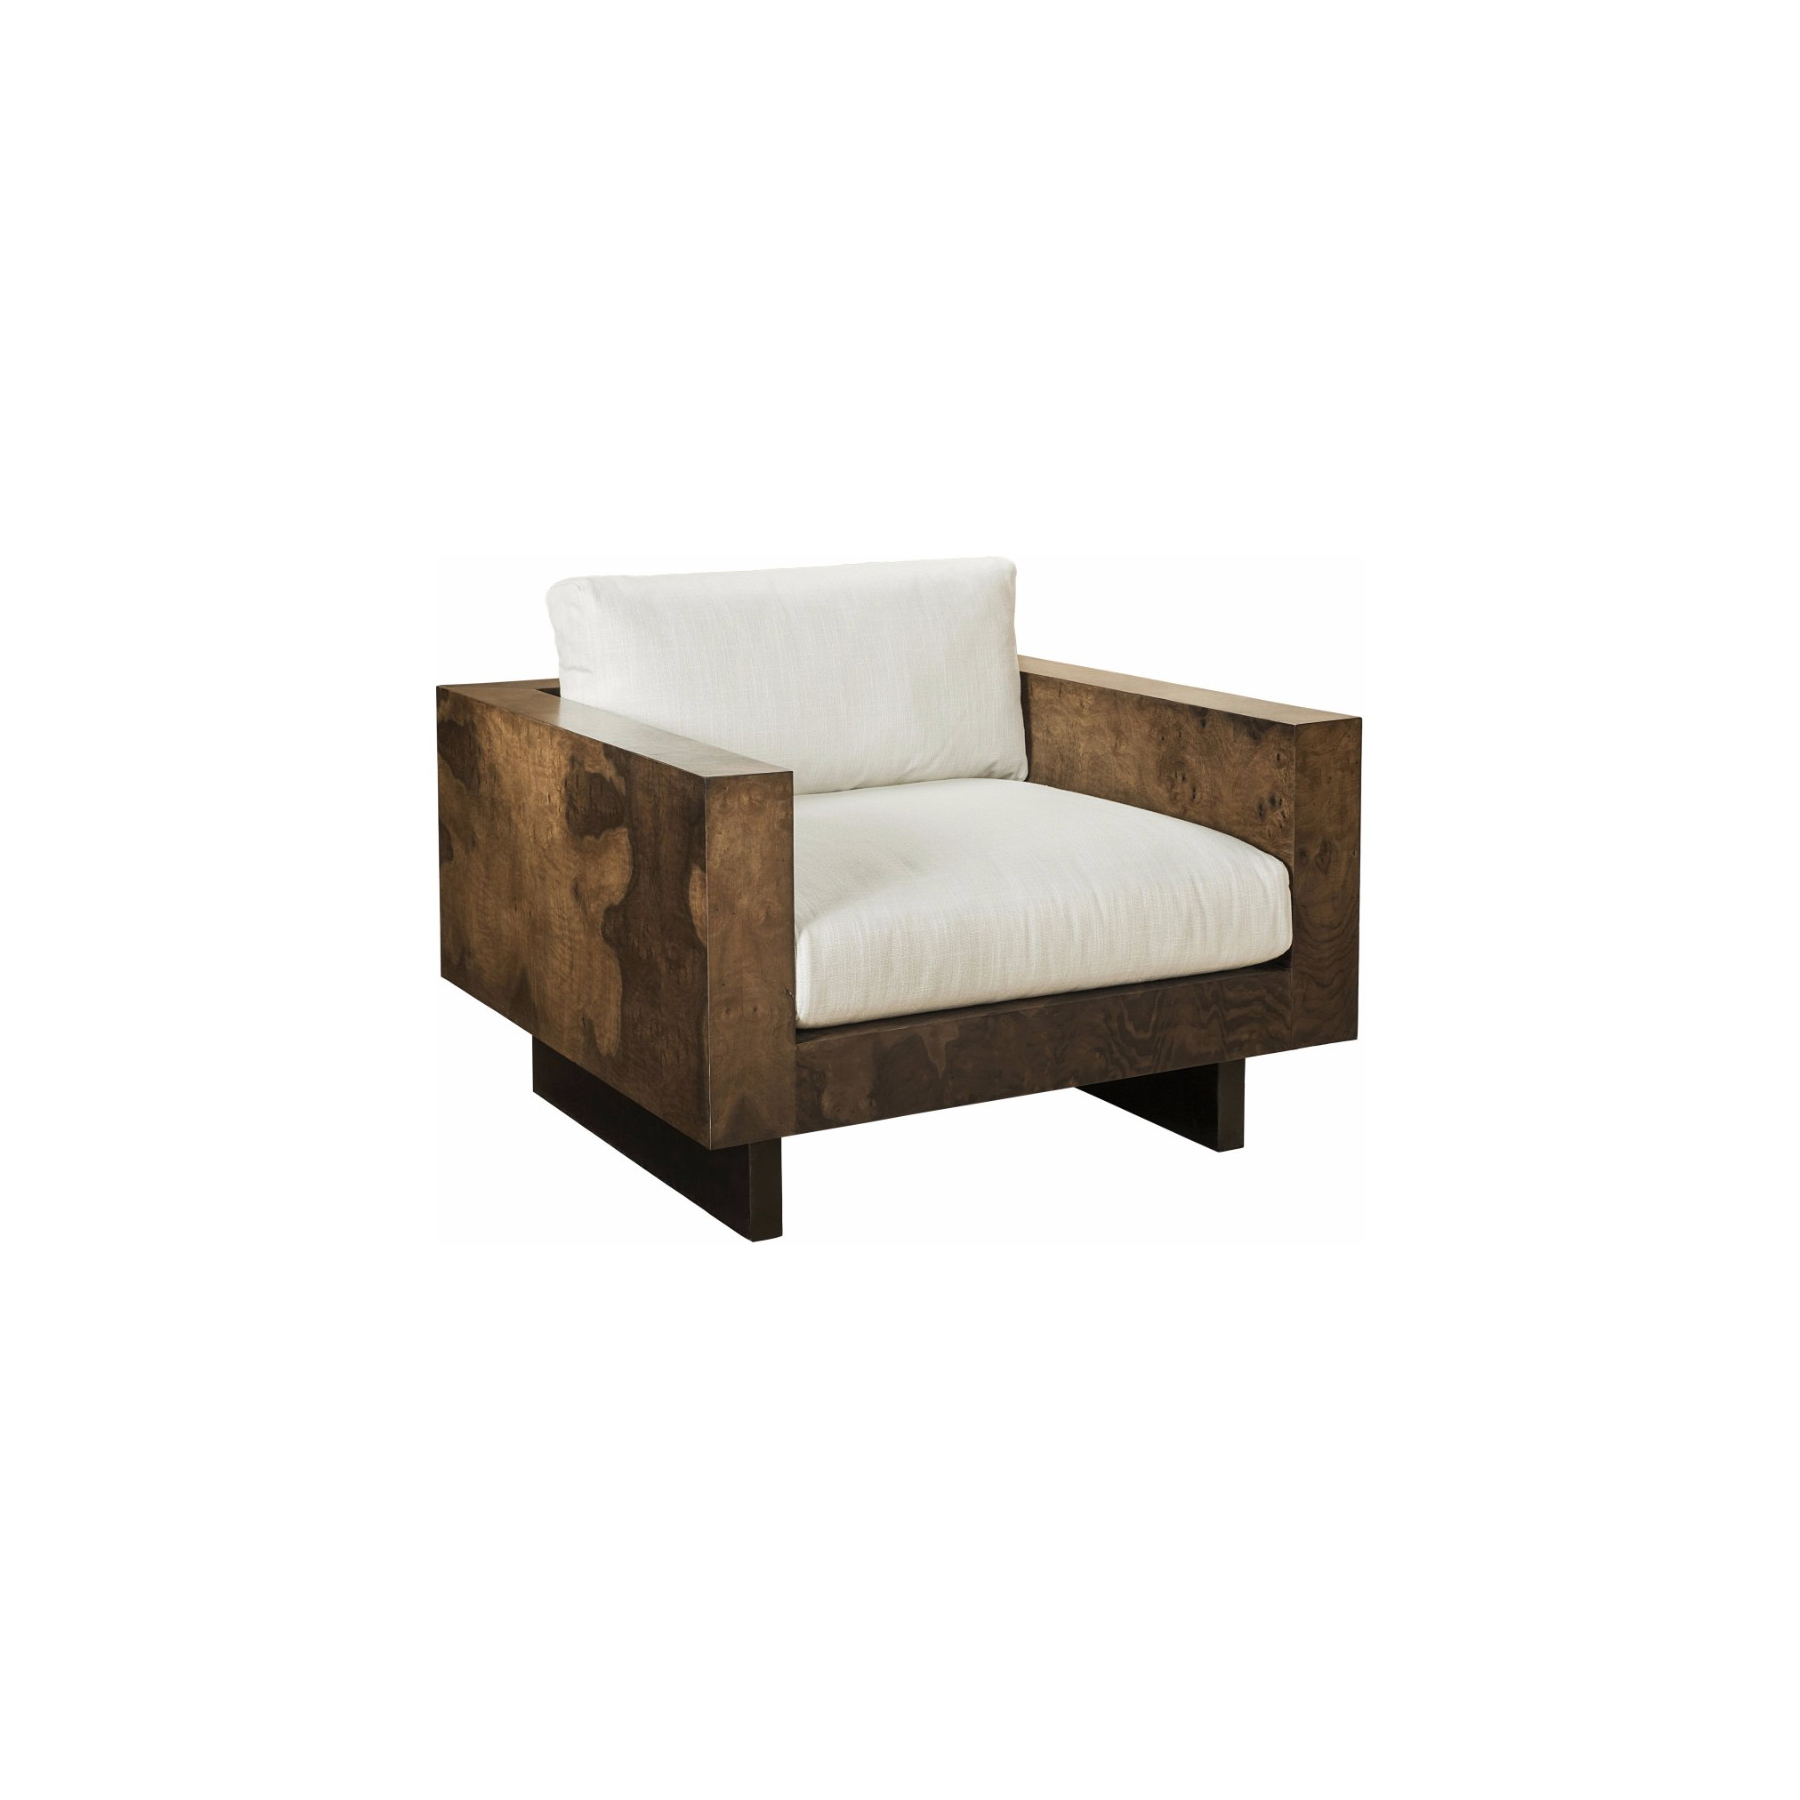 Pinto Lounge Chair copy.jpg